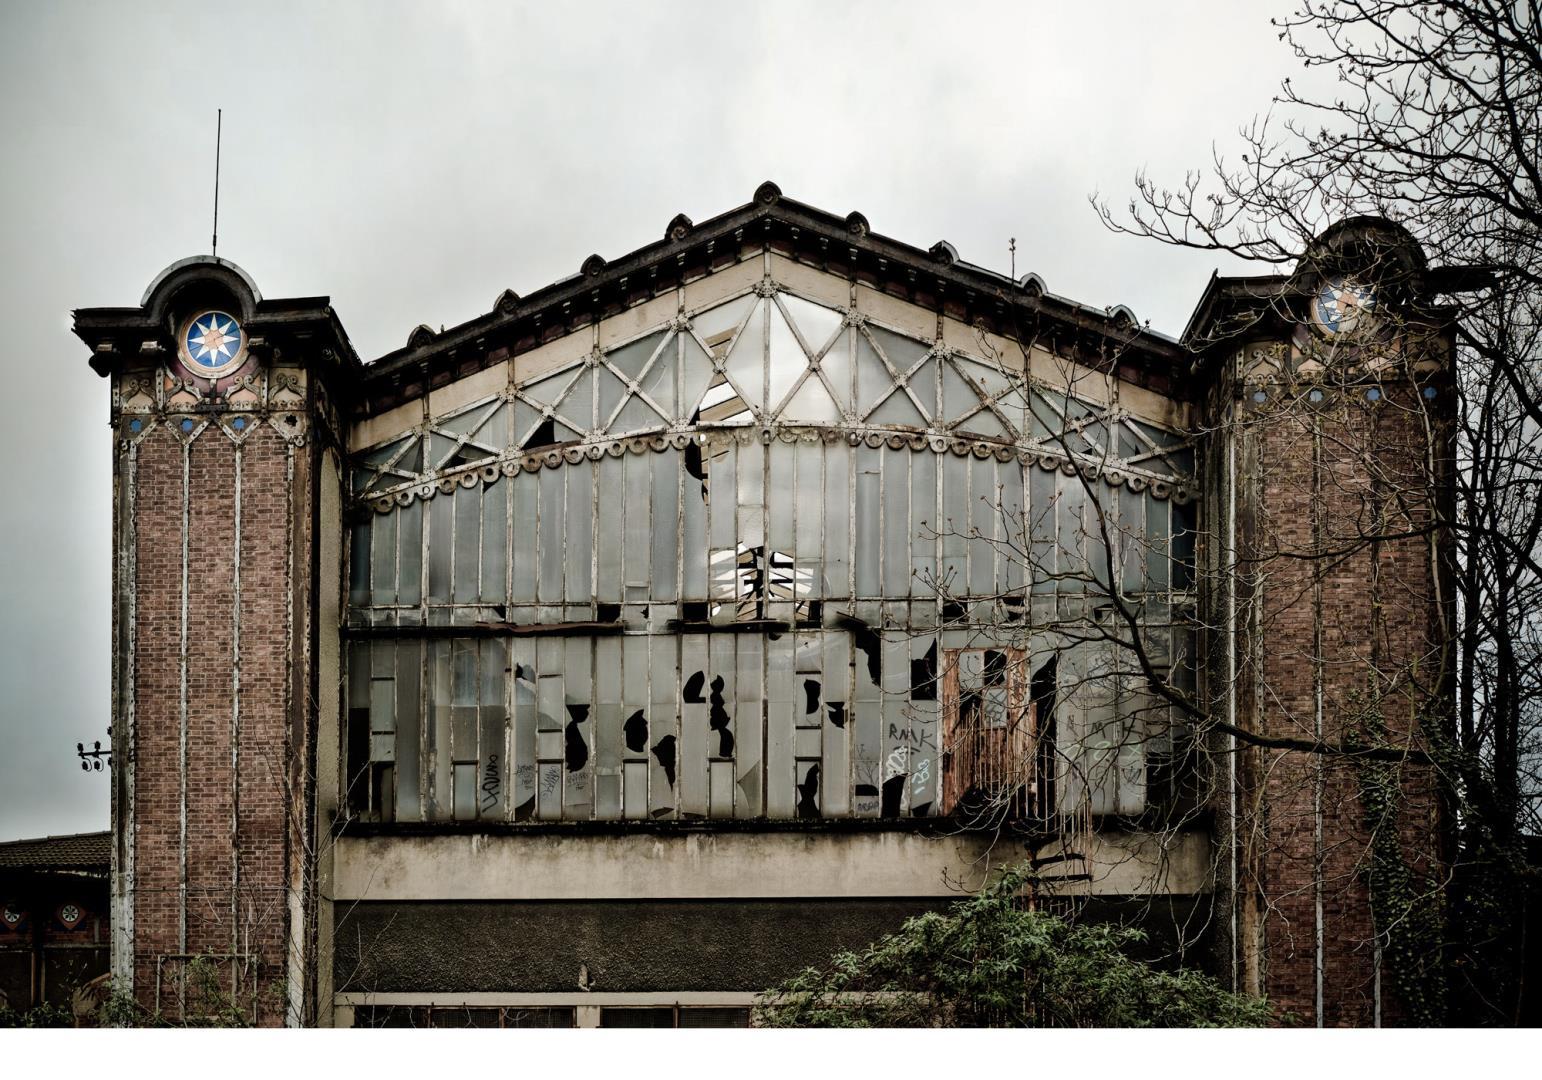 GARE LISCH RENAISSANCE - Gare Lisch Renaissance